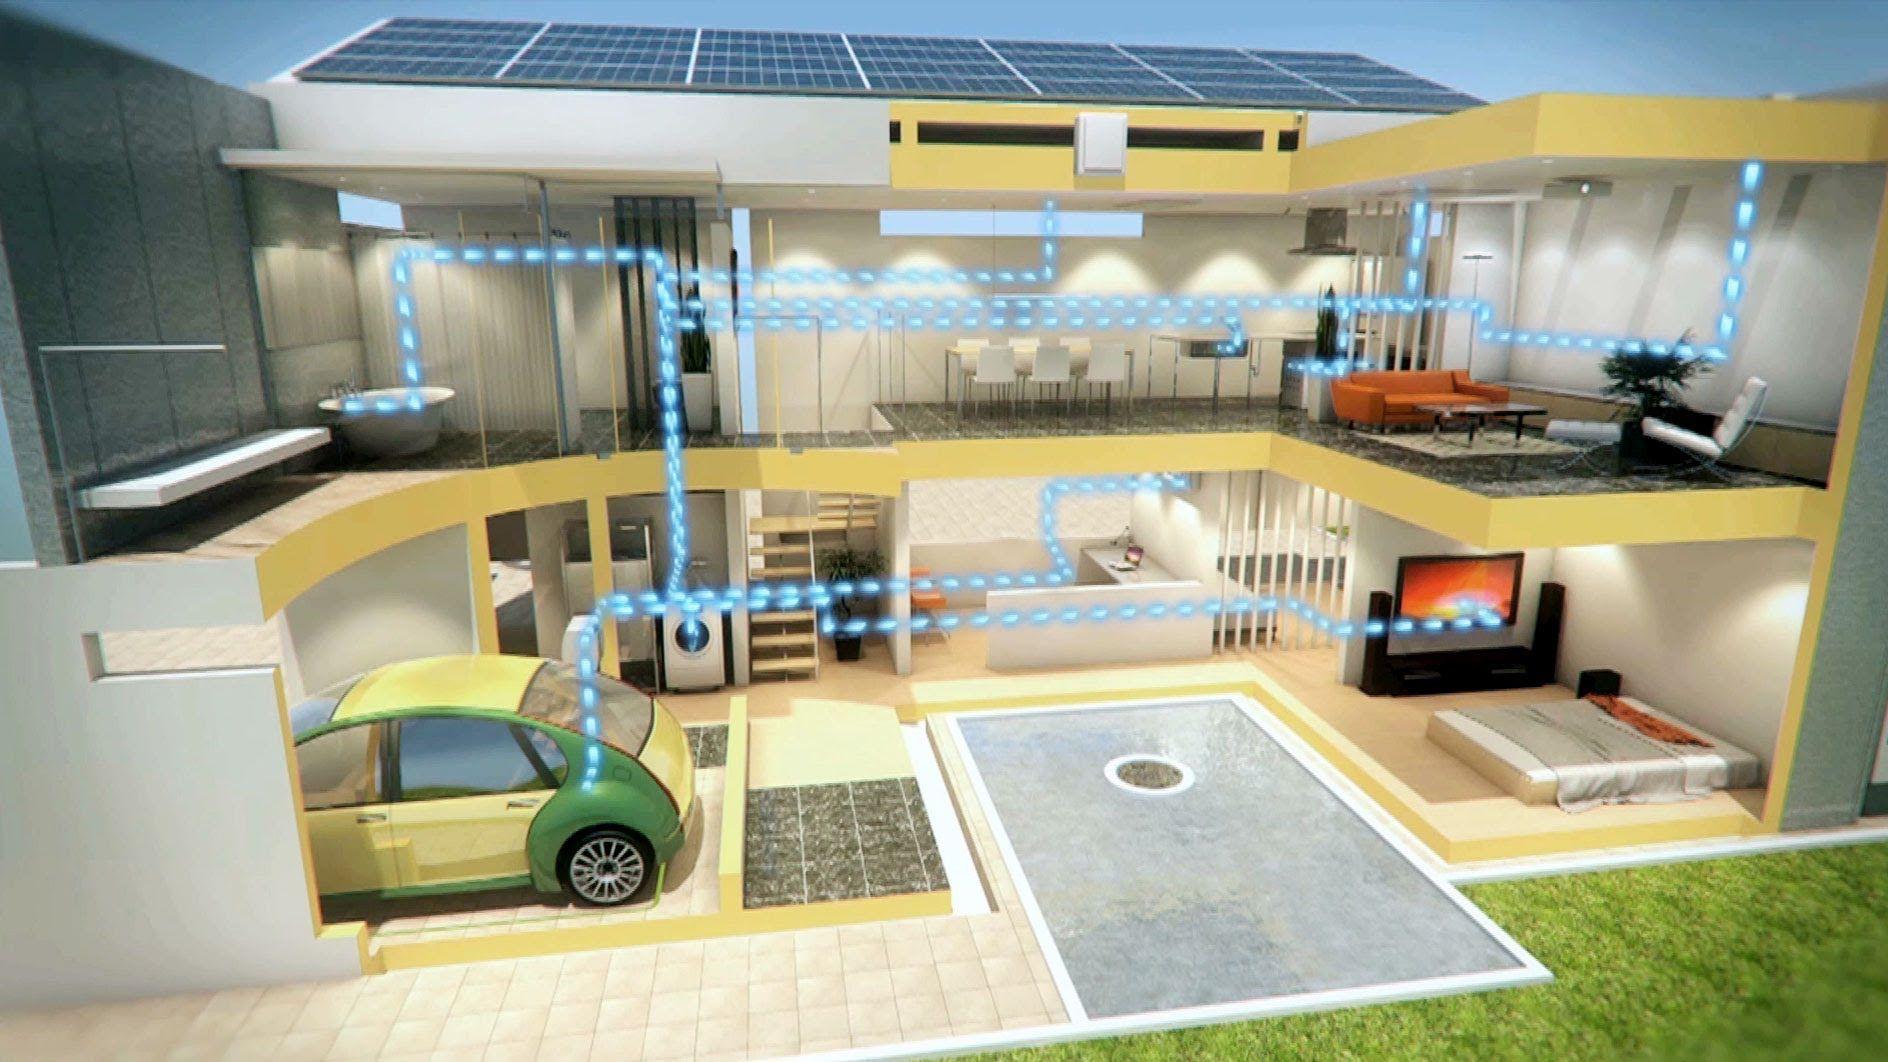 Intermeidate General Smart Green Homes Of The Near Future